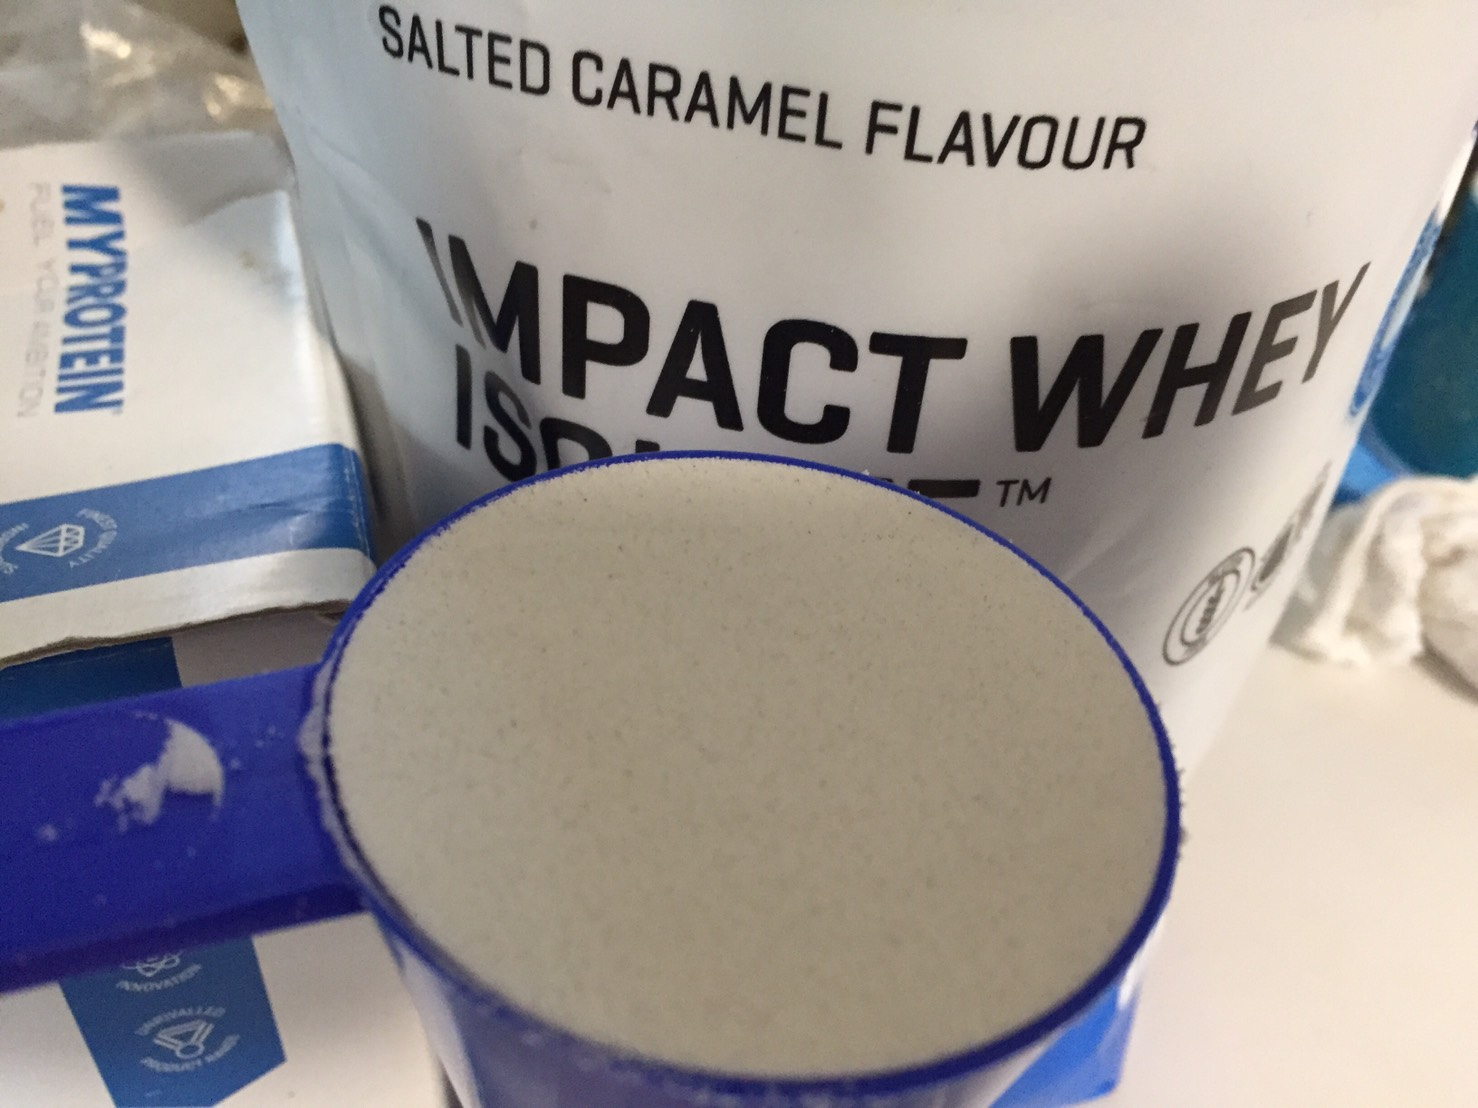 【WPI】IMPACT 分離ホエイプロテイン (アイソレート)「SALTED CARAMEL FLAVOUR(塩キャラメル味)」の様子